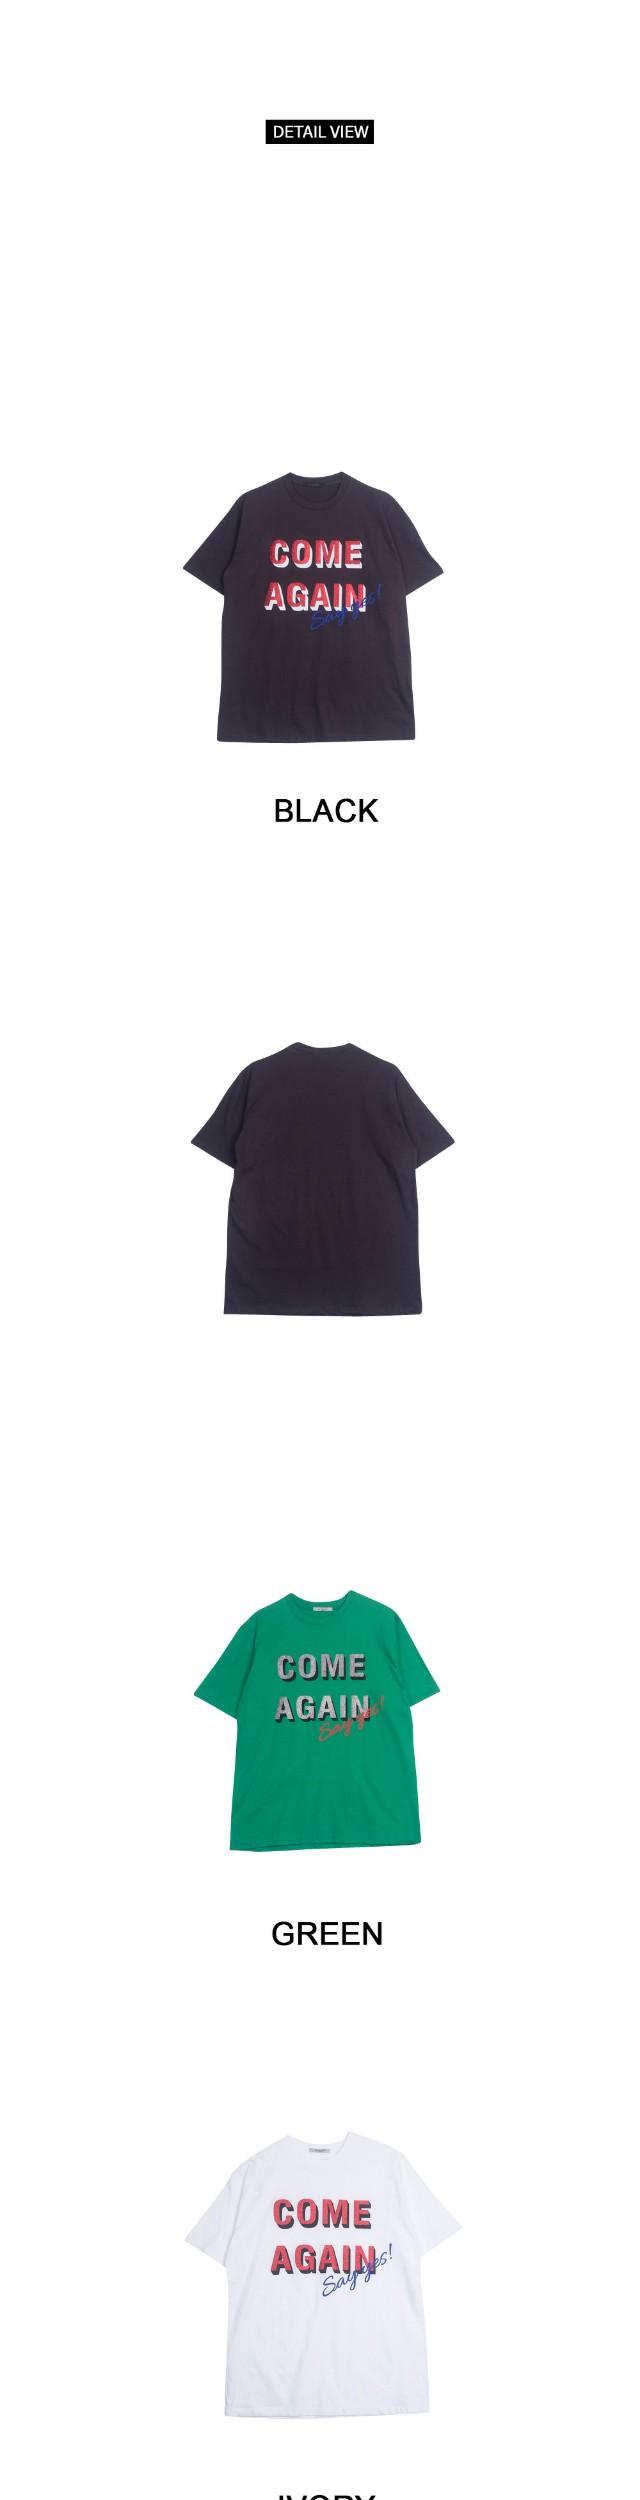 Ageless short-sleeved tee